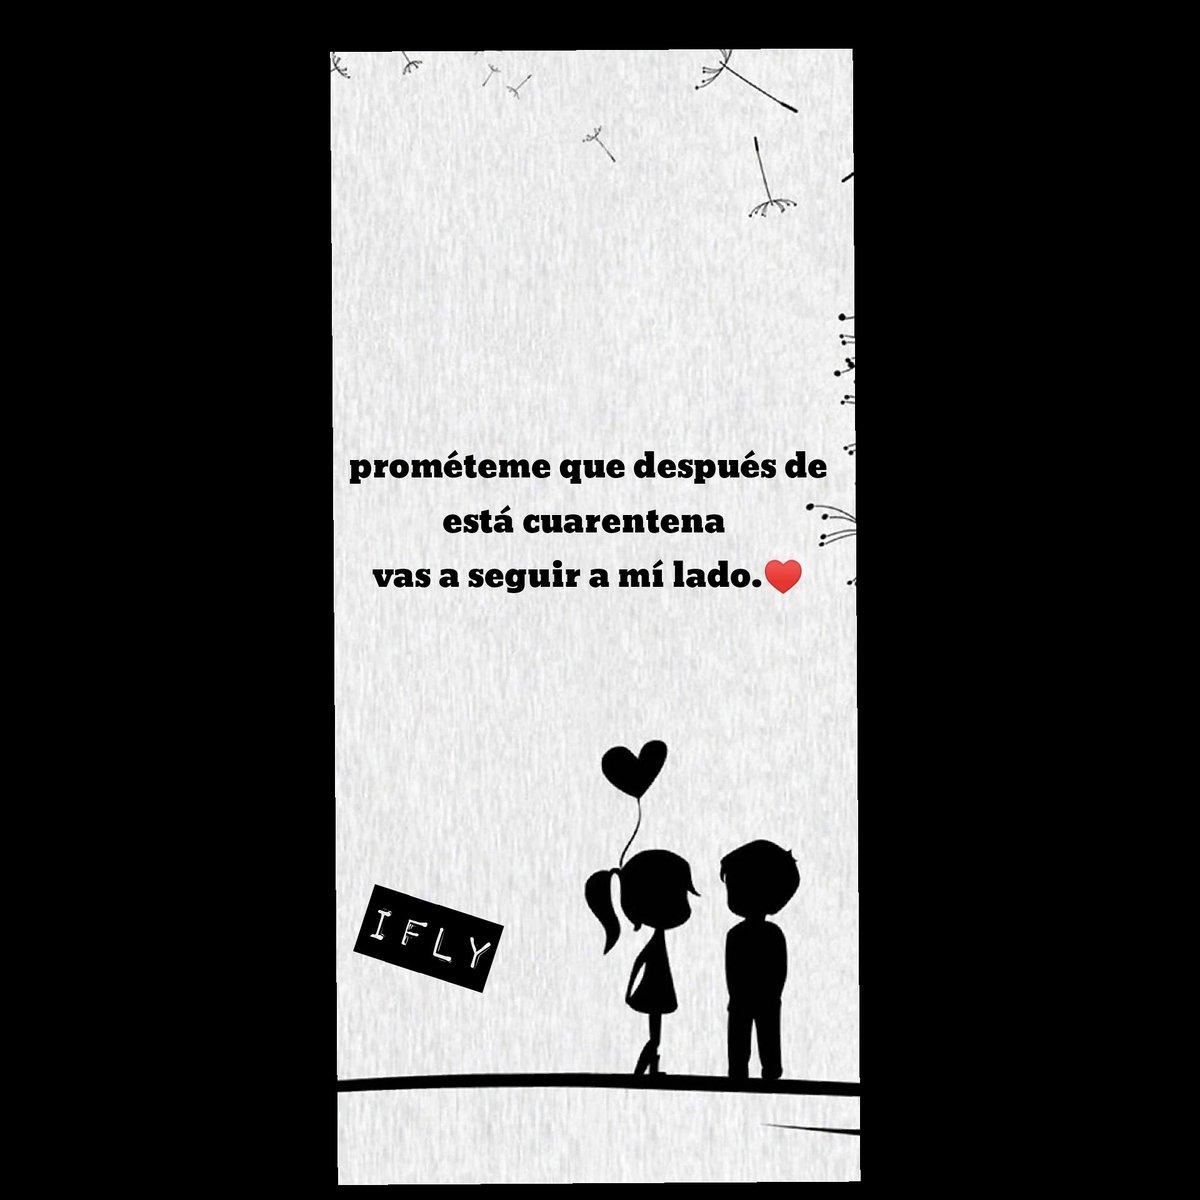 Prometelo #parejas #novios #distanciaamorpic.twitter.com/kboxAtMTwU